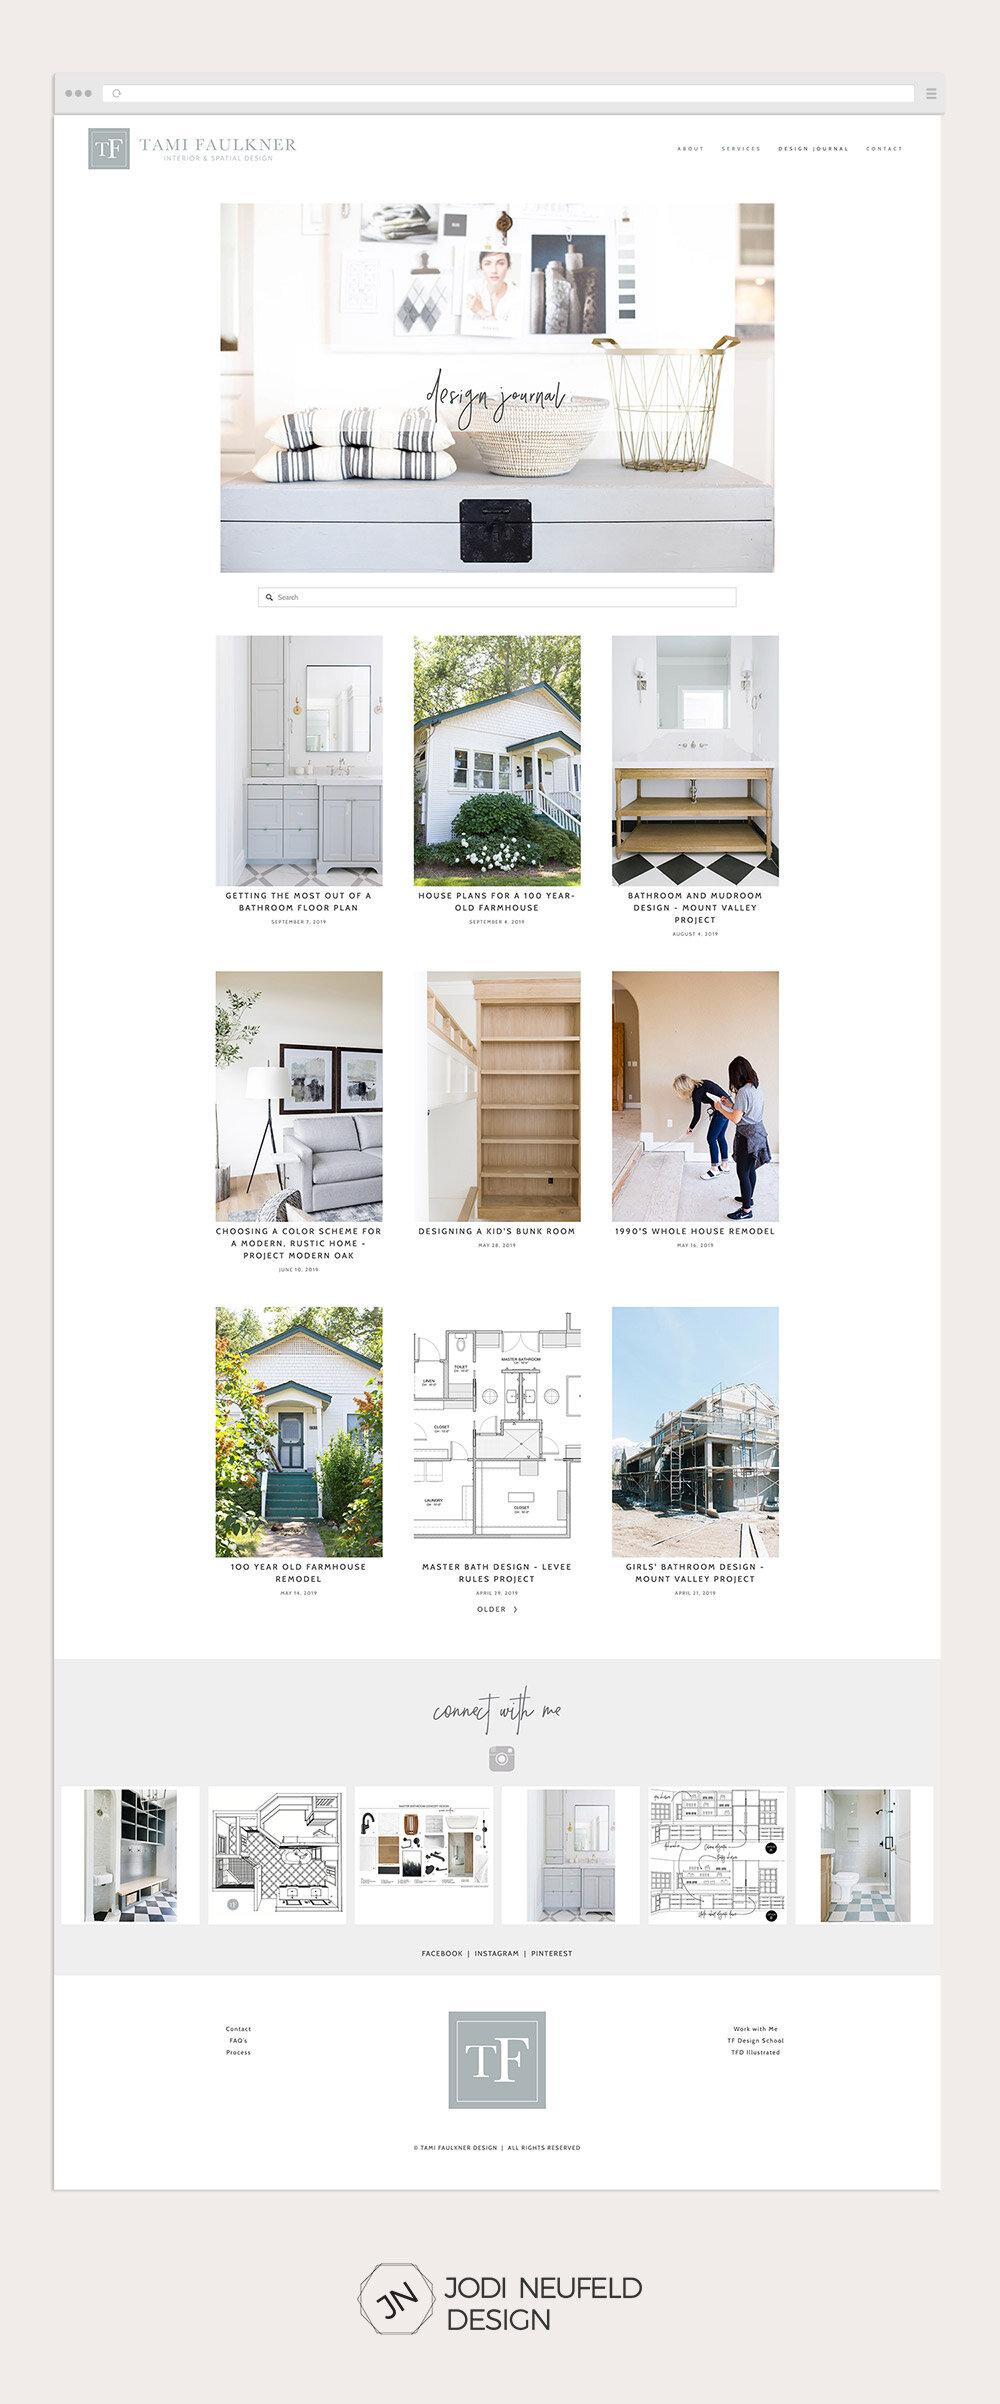 Squarespace webdesign | Interior Designer blog page by Jodi Neufeld Design #squarespace #webdesign #blog